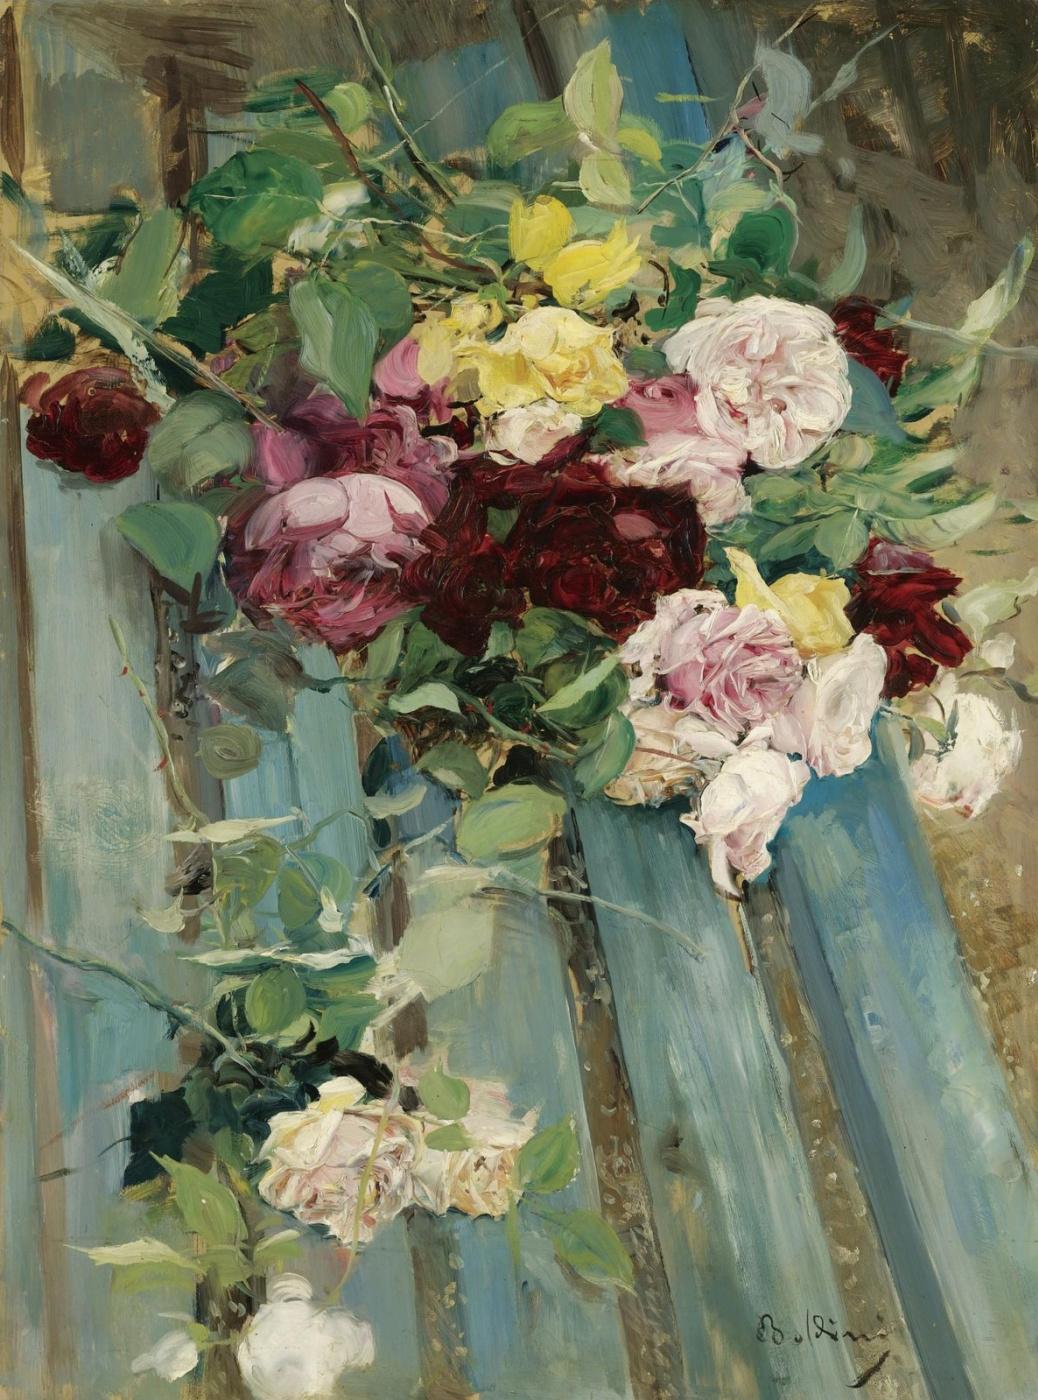 Giovanni Boldini. Still-life with roses